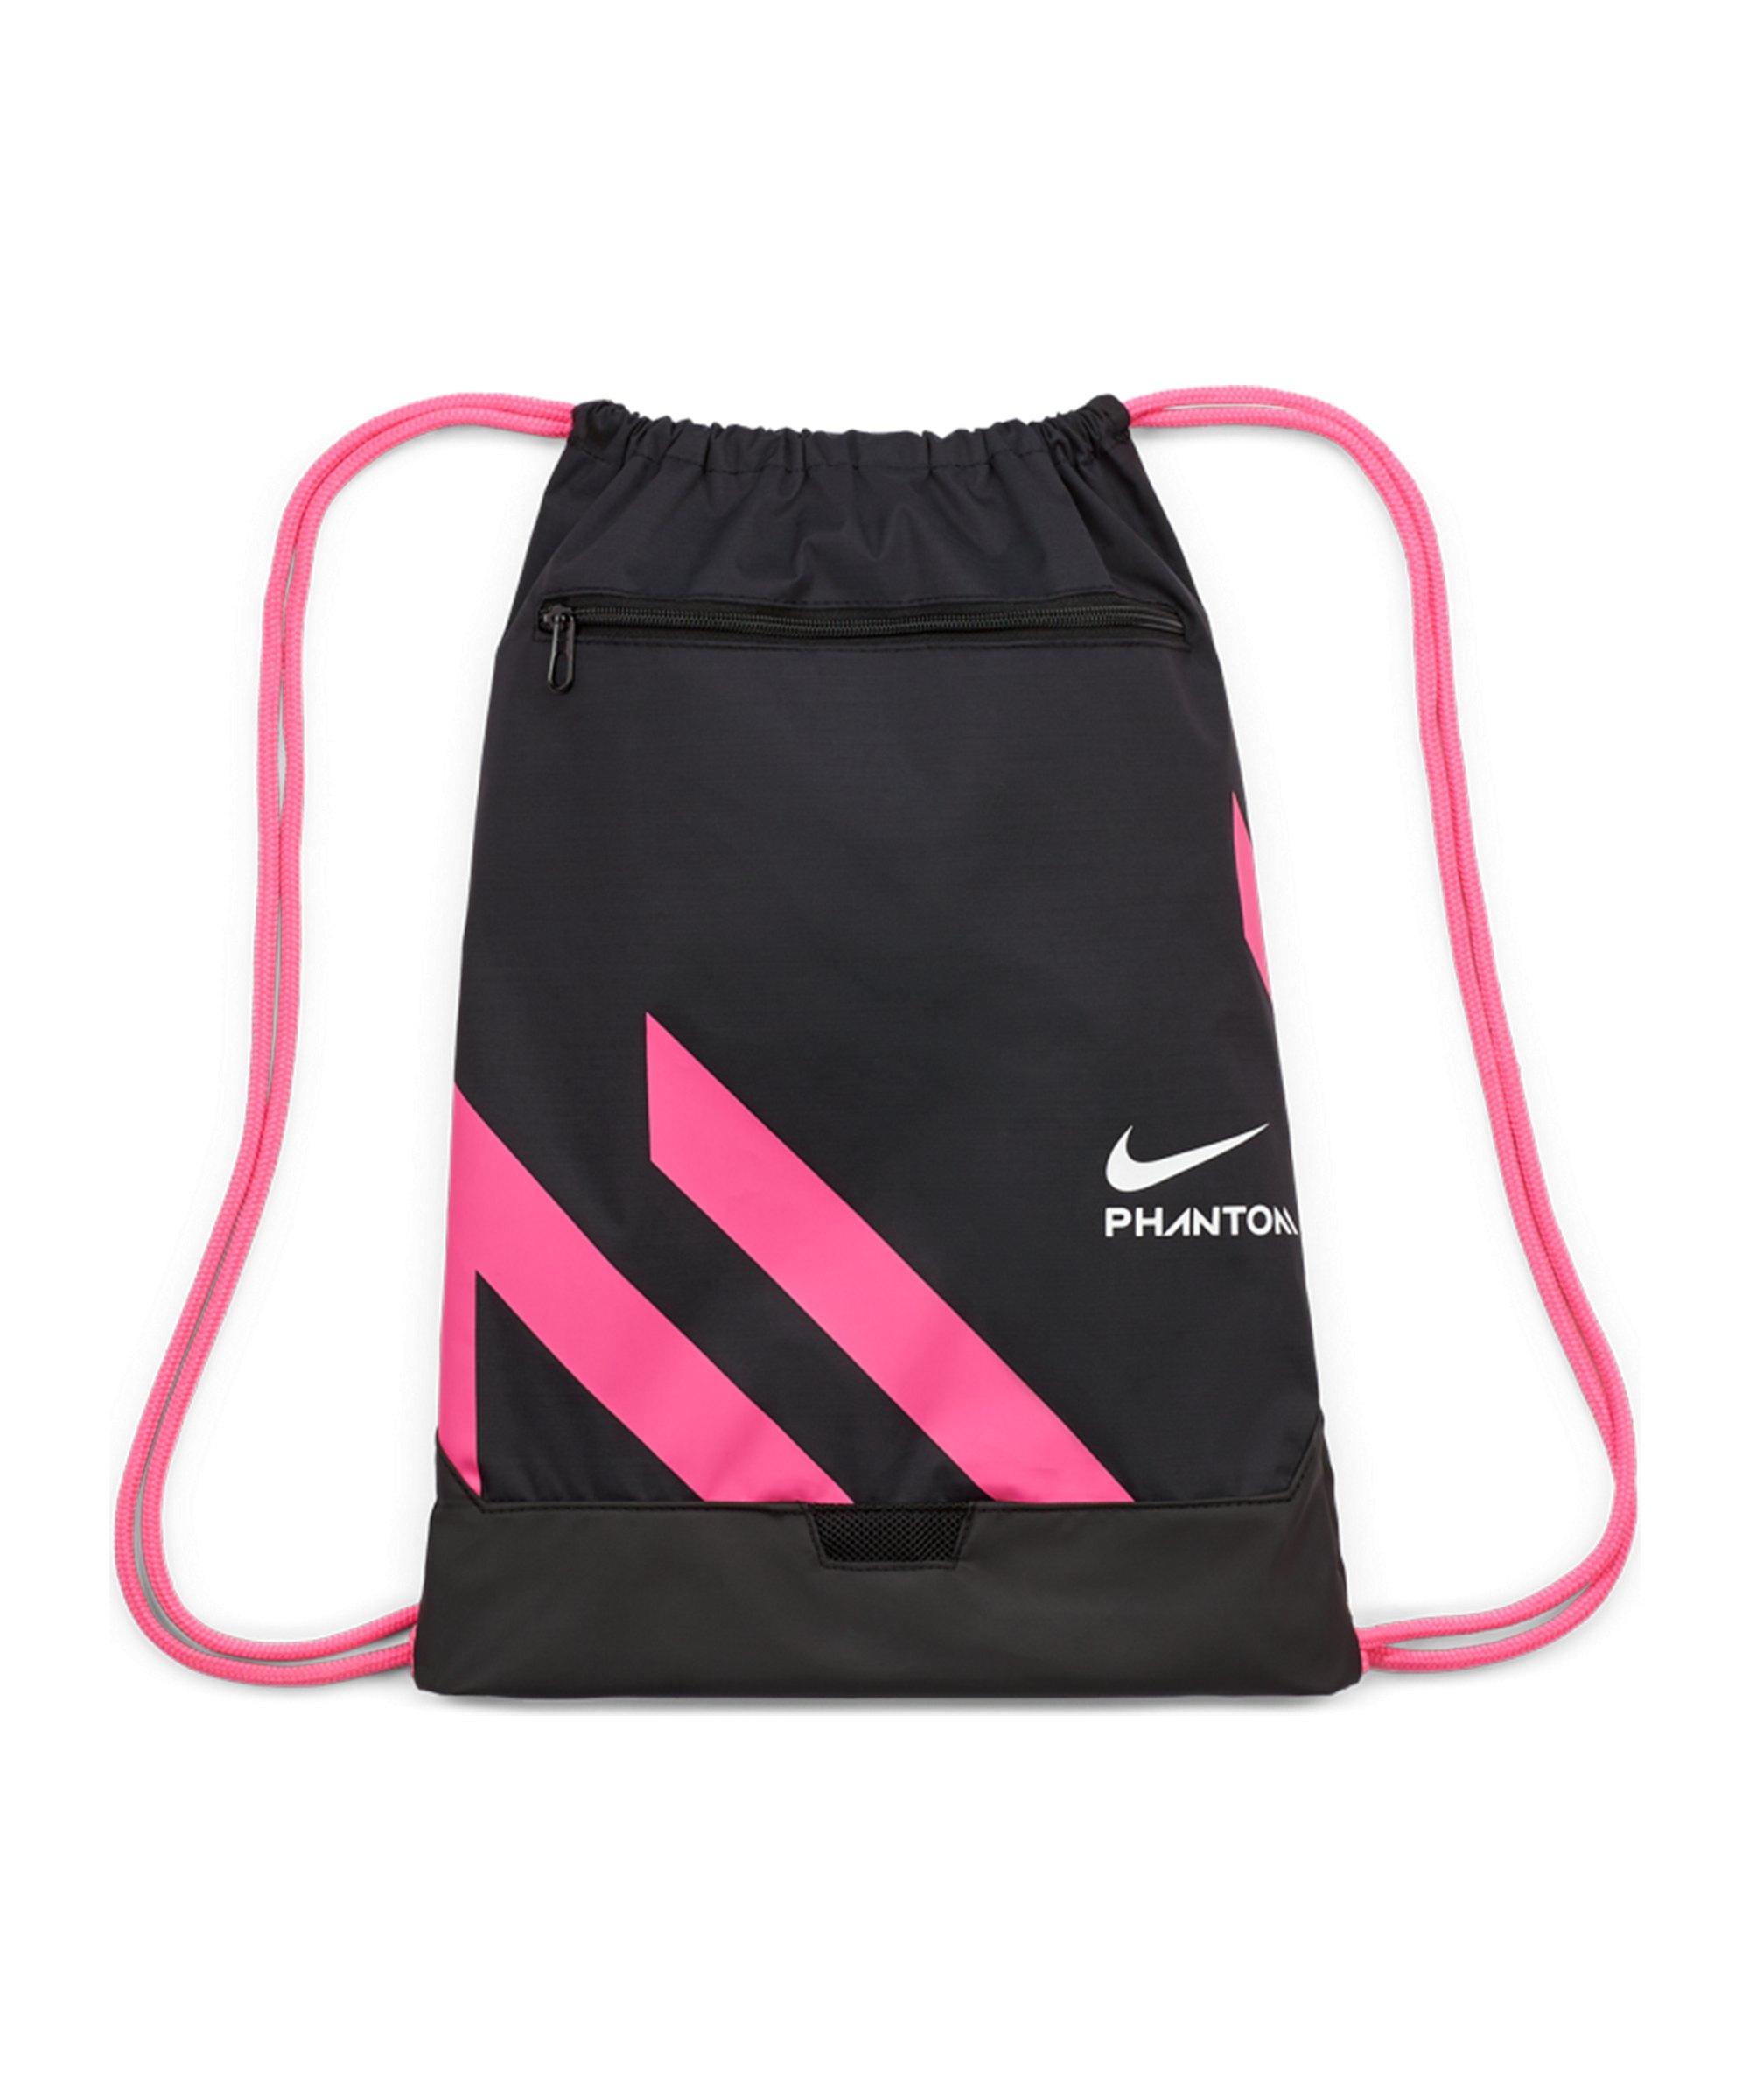 Nike Phantom Soccer Gymsack Schwarz Pink F011 - pink